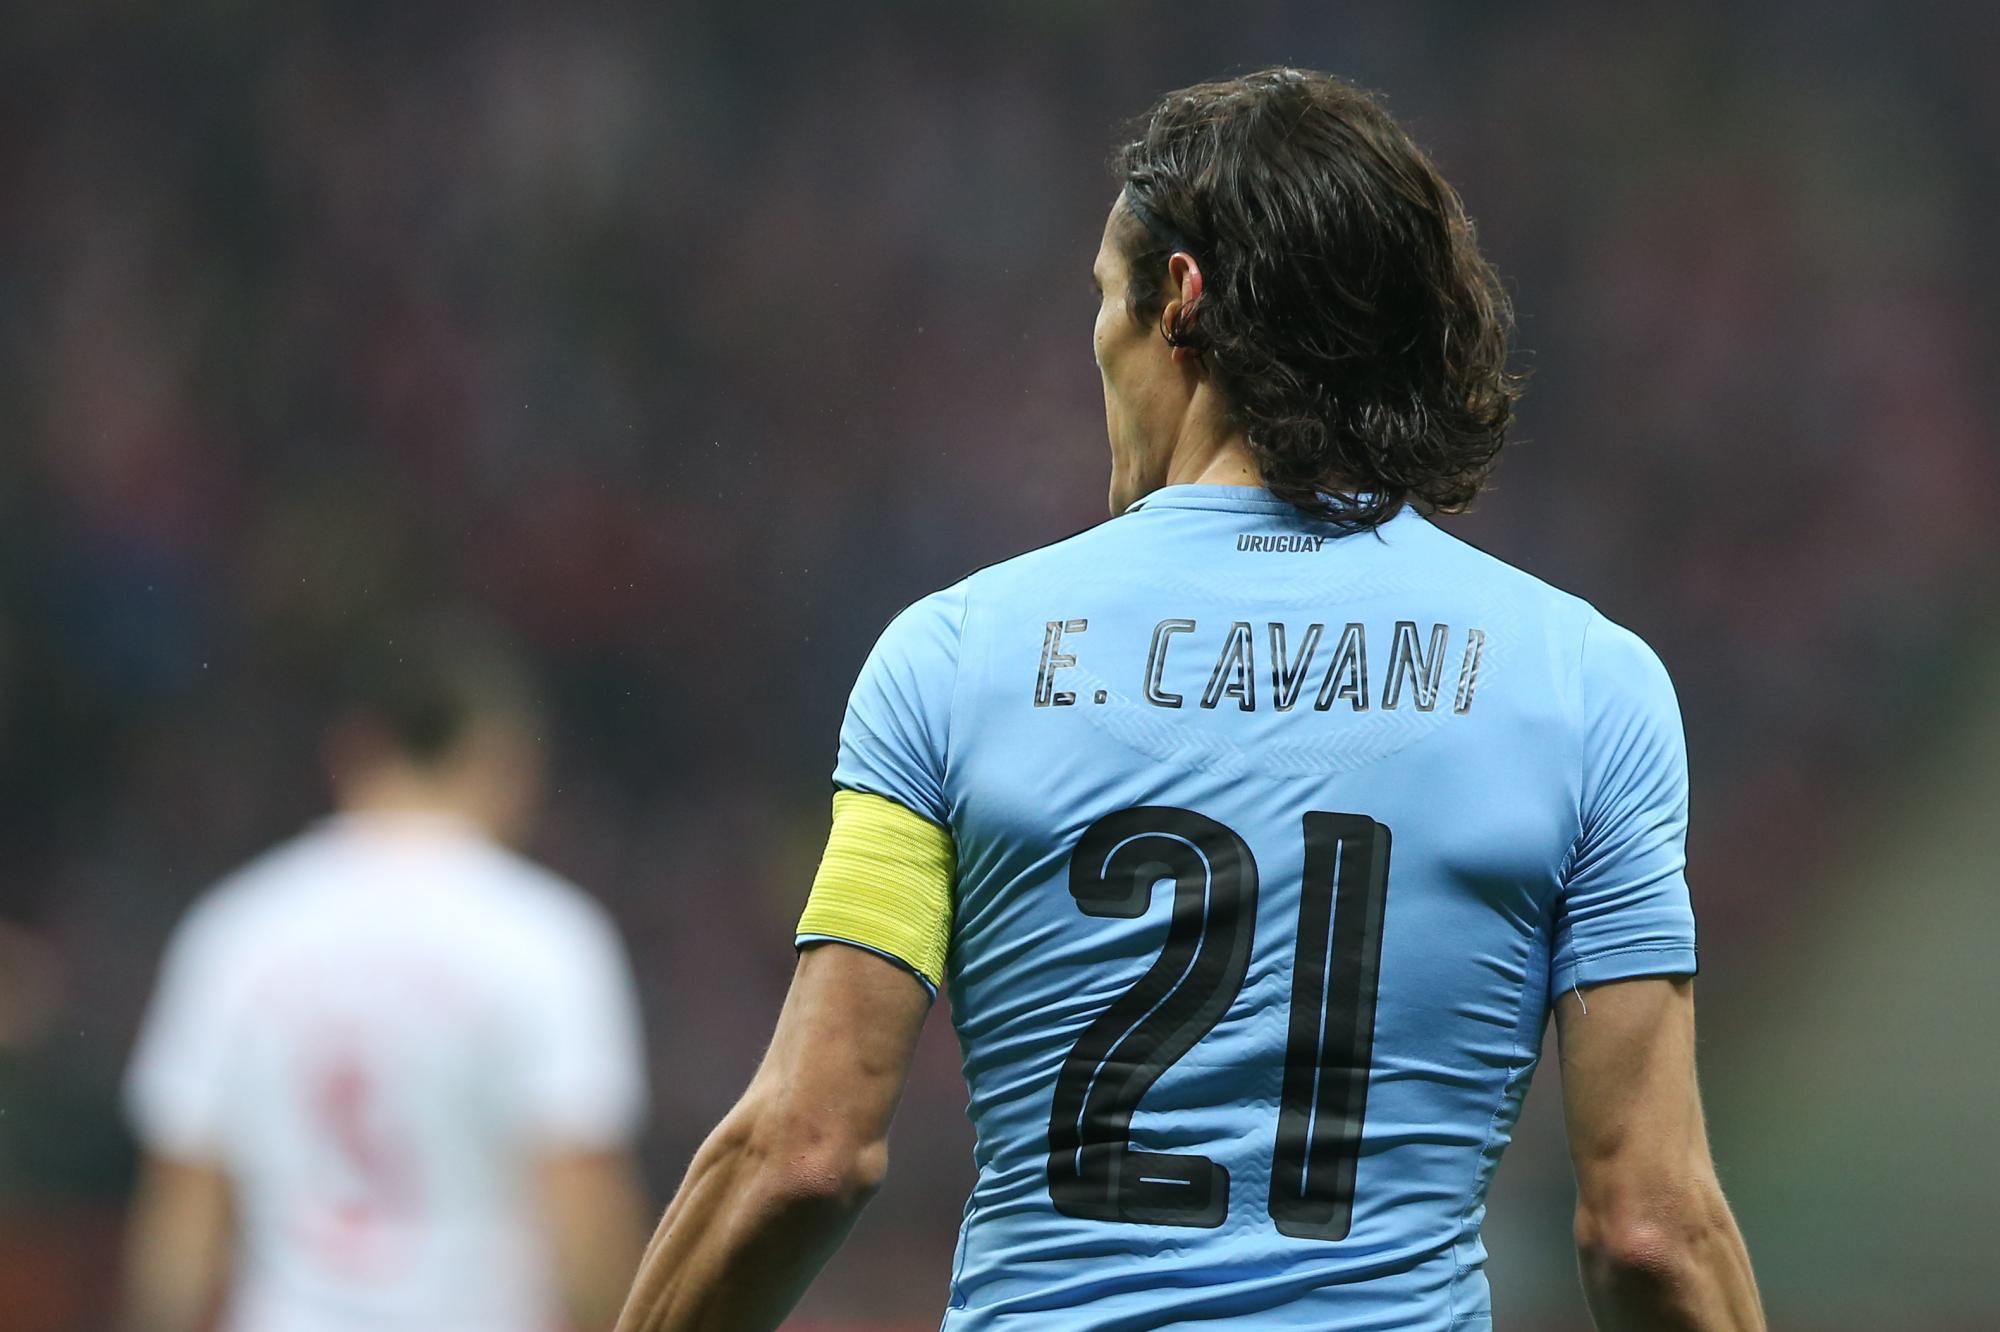 buy online 5a07d fd32d Ahead of today's Portugal Clash, Uruguay's Edinson Cavani ...